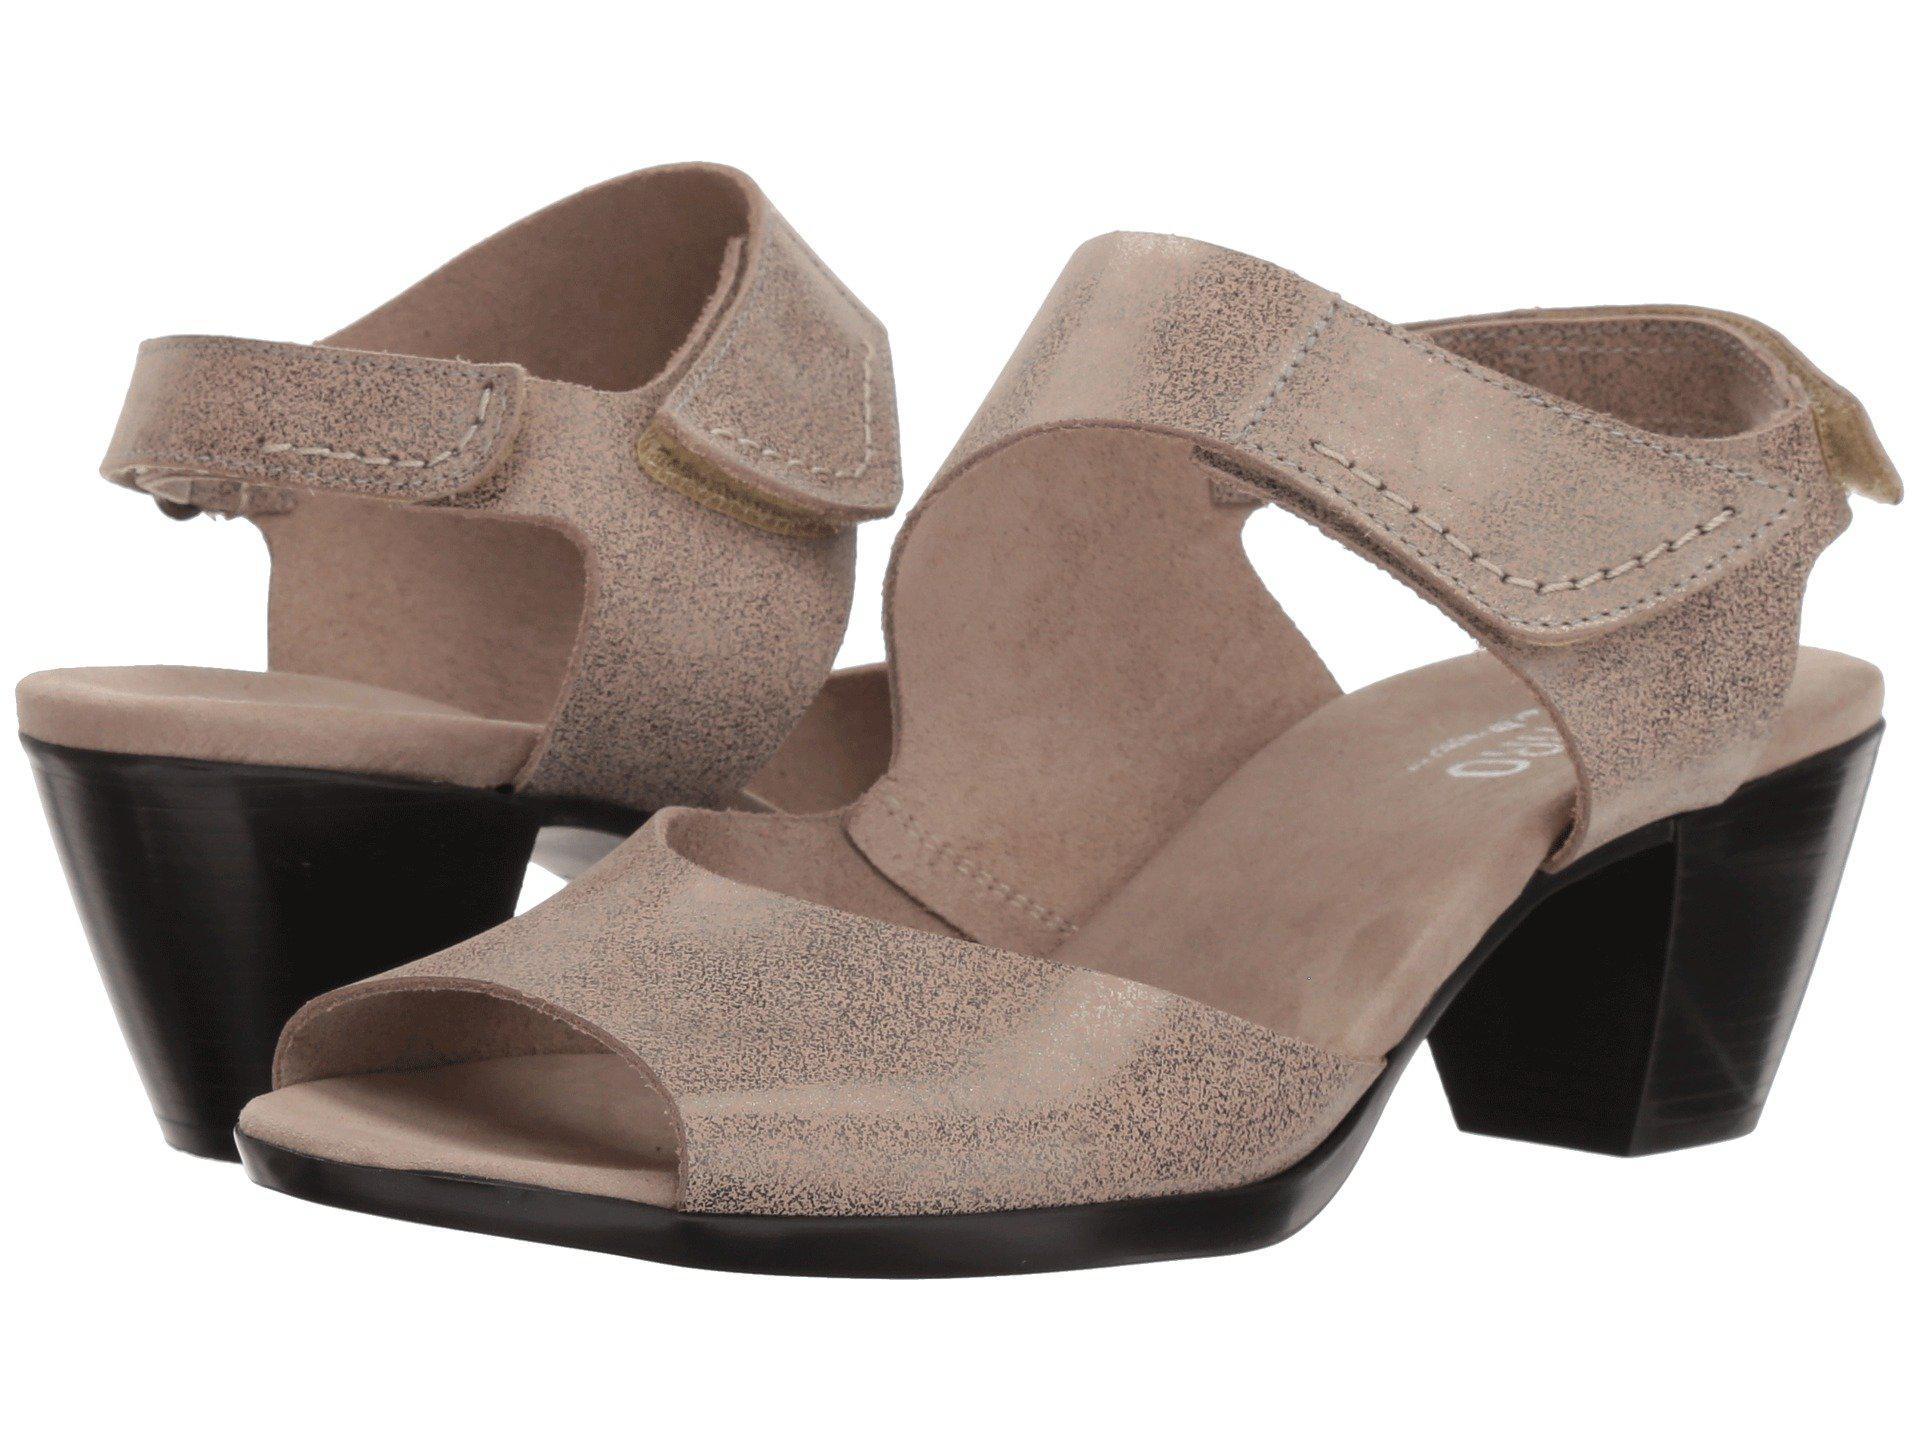 c27107f85d5 Lyst - Munro Fabiana (black Nubuck) Women s Sandals